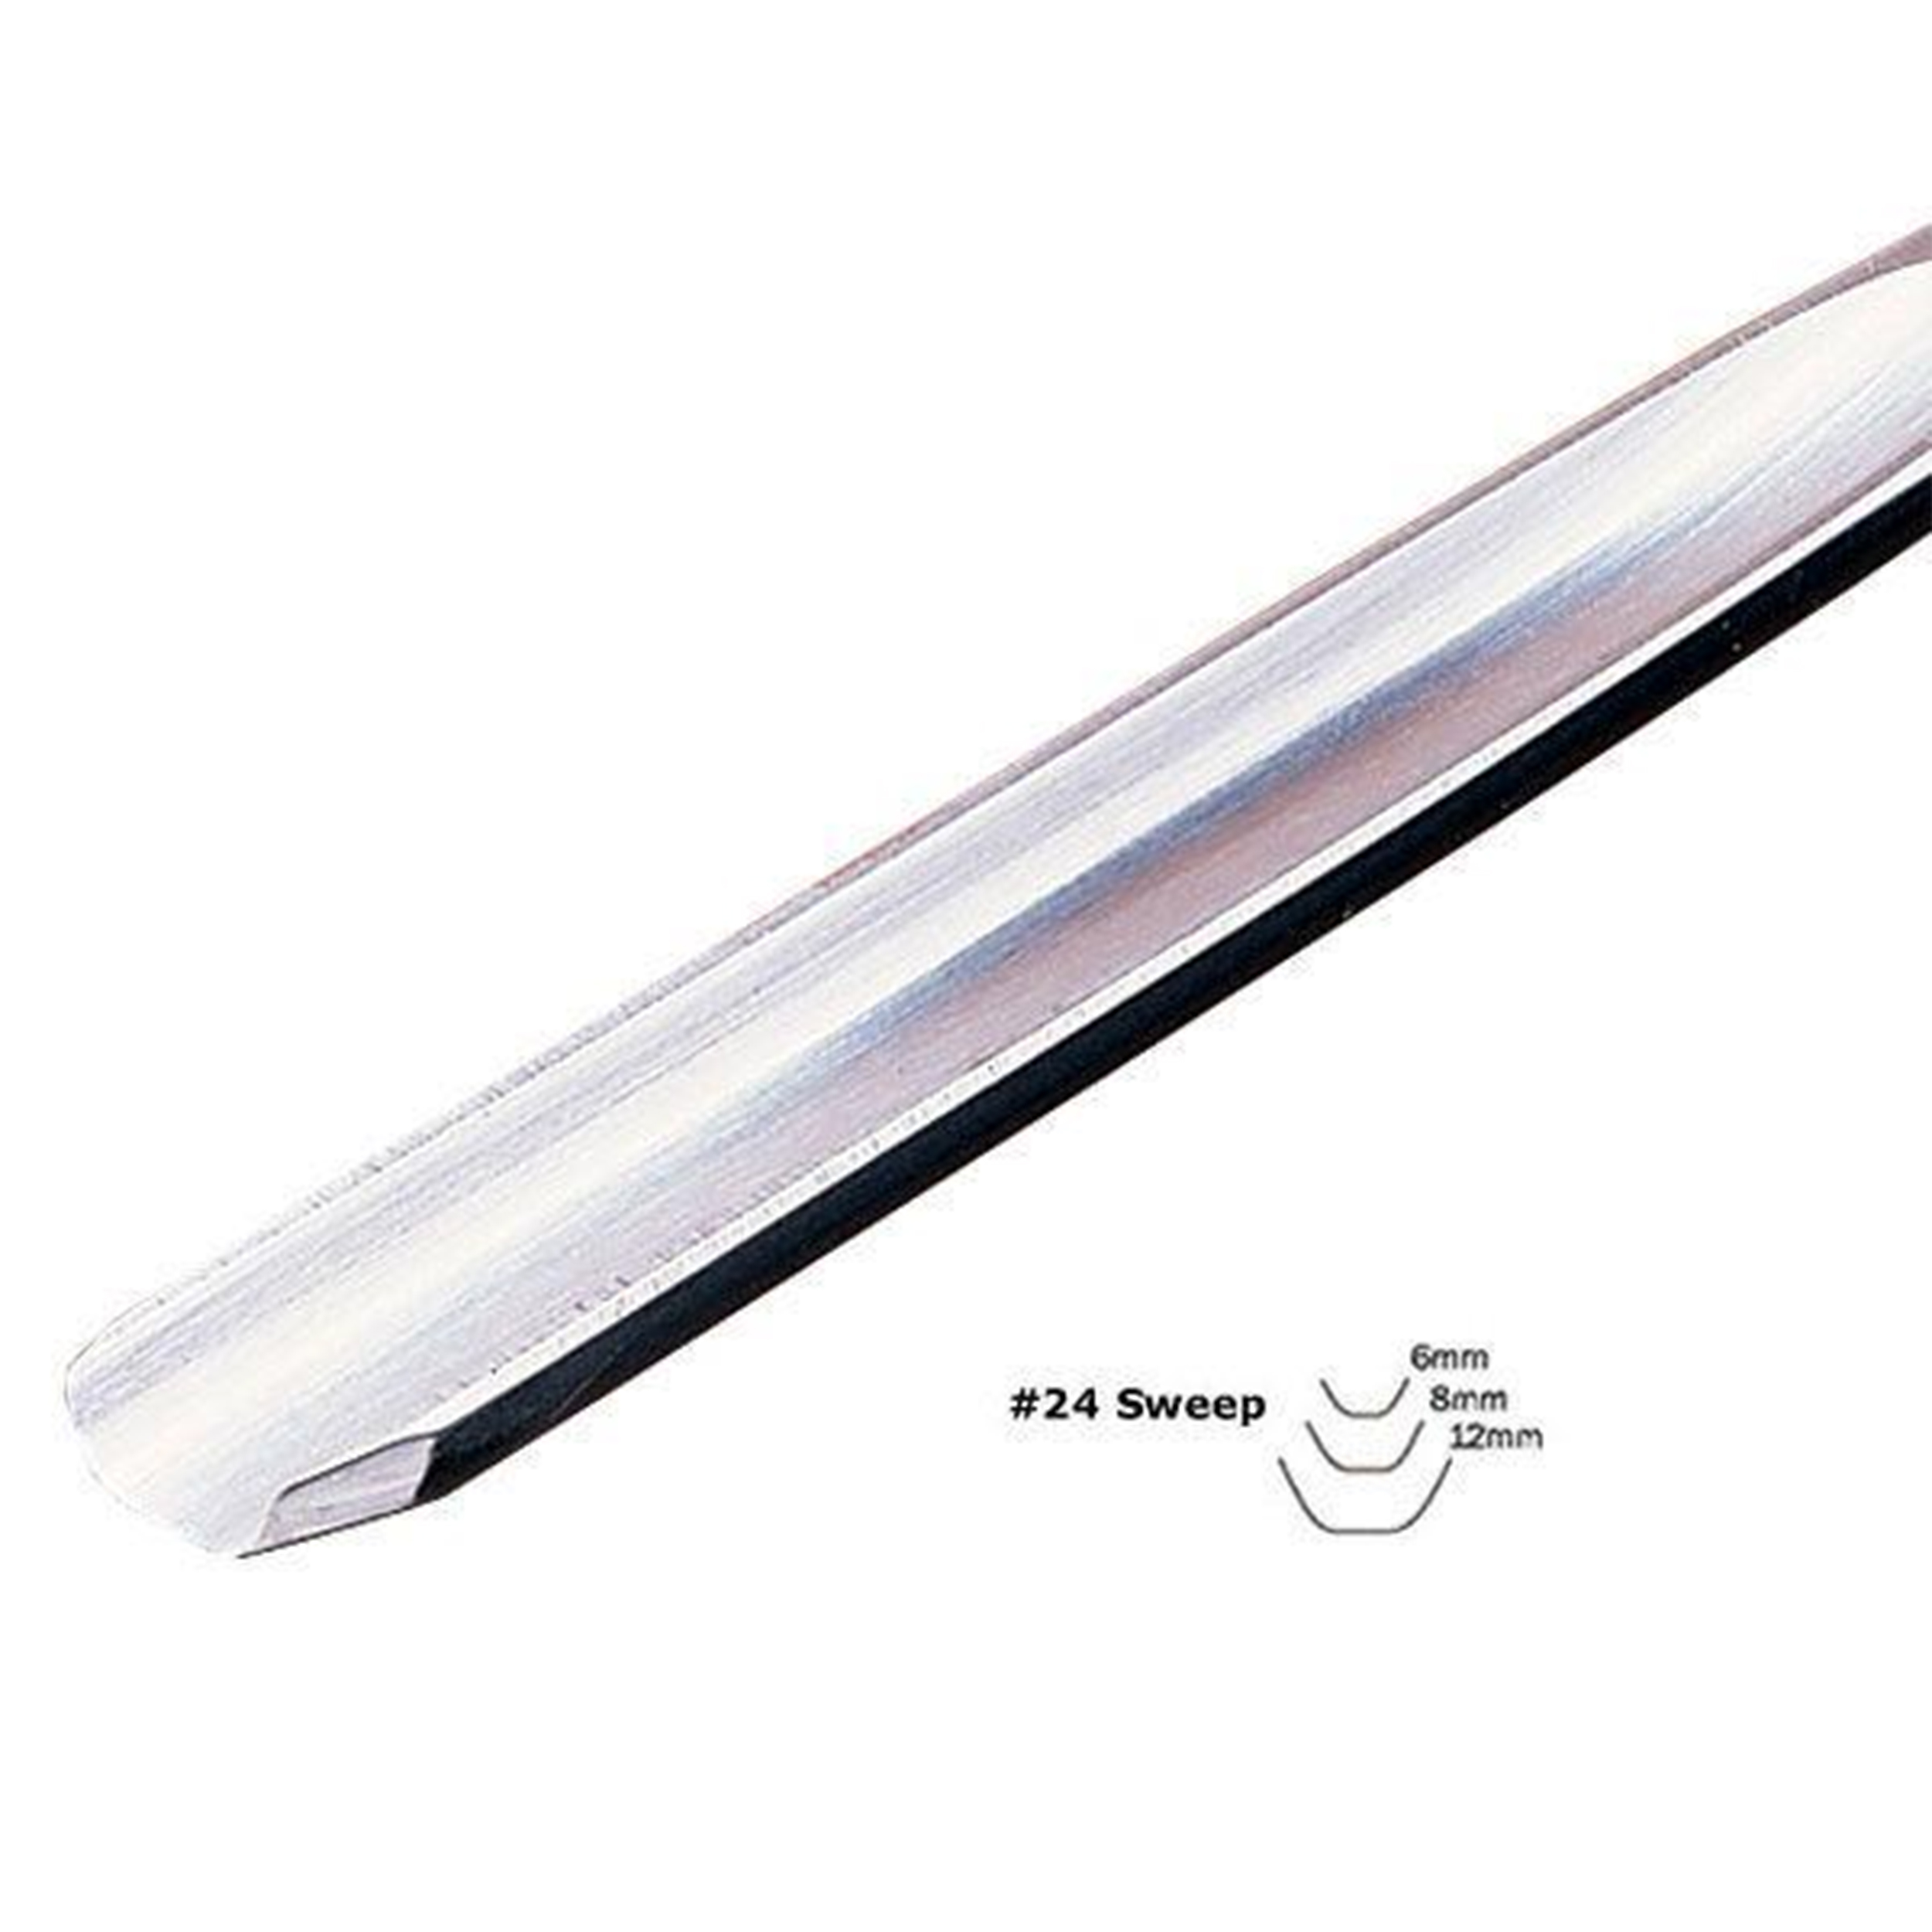 #24 Sweep Fluteroni Gouge 8 mm, Full Size